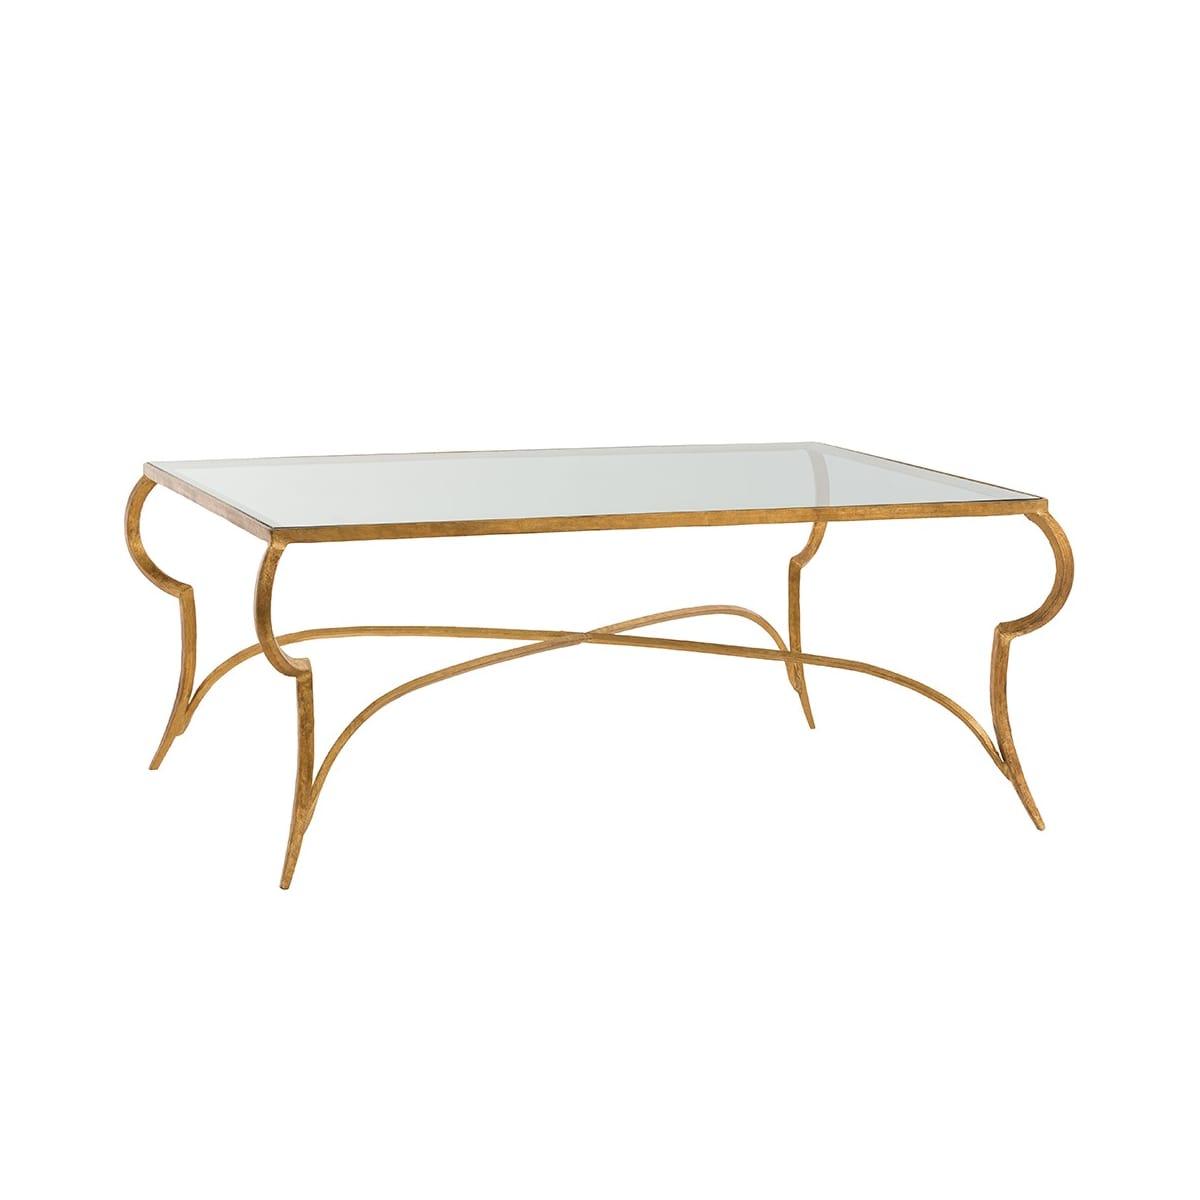 Astounding Arteriors 6181 Gold Leaf Elba 42 Inch Long Glass Top Iron Machost Co Dining Chair Design Ideas Machostcouk